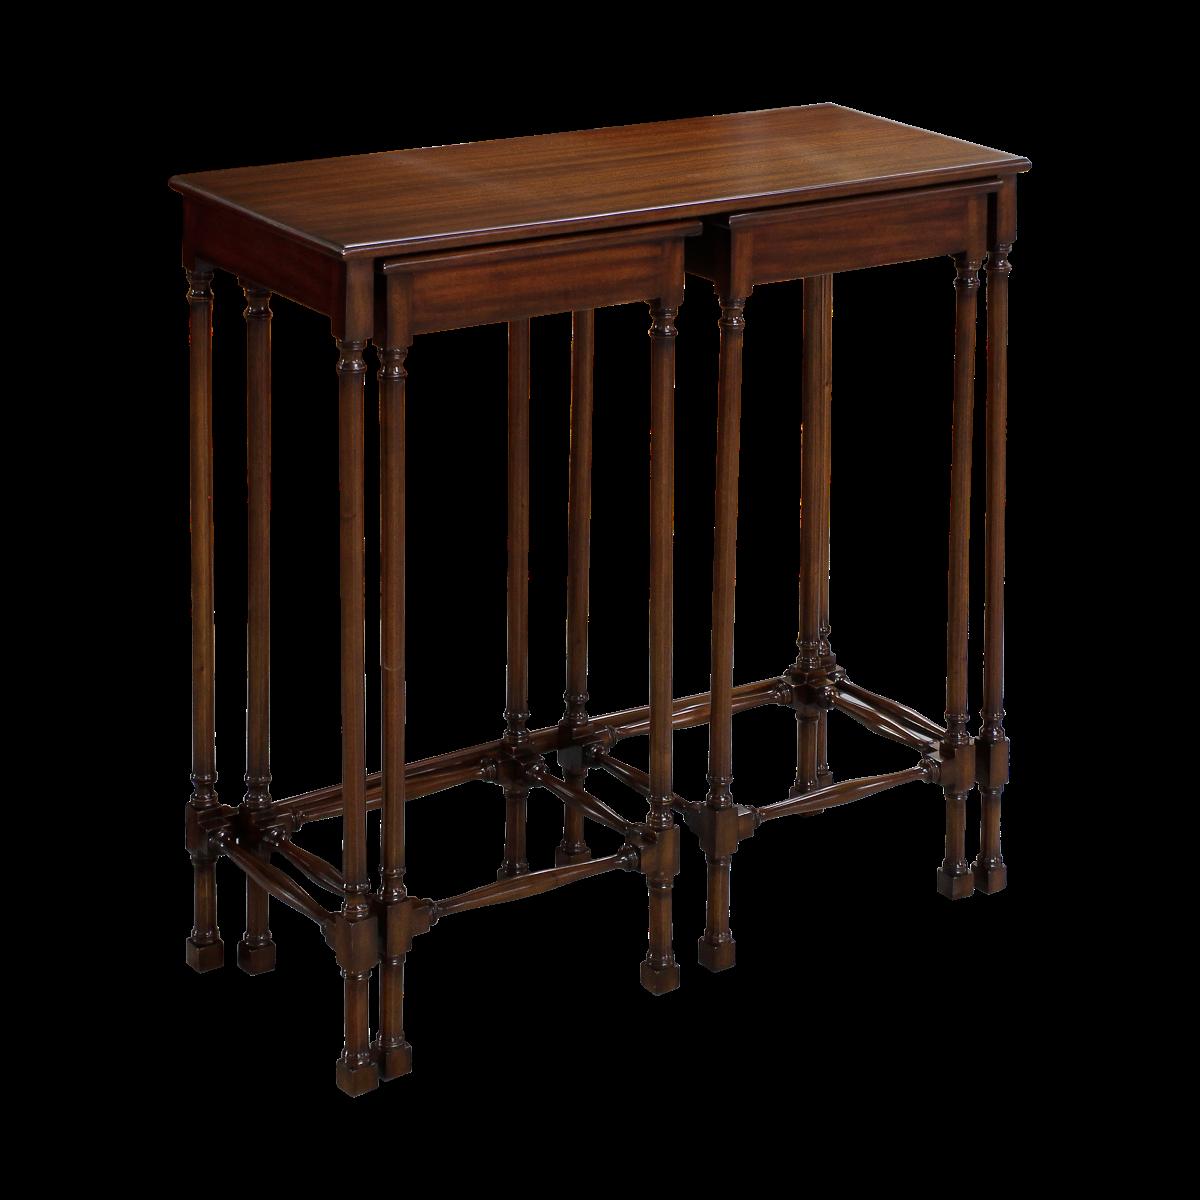 33040 set of three table